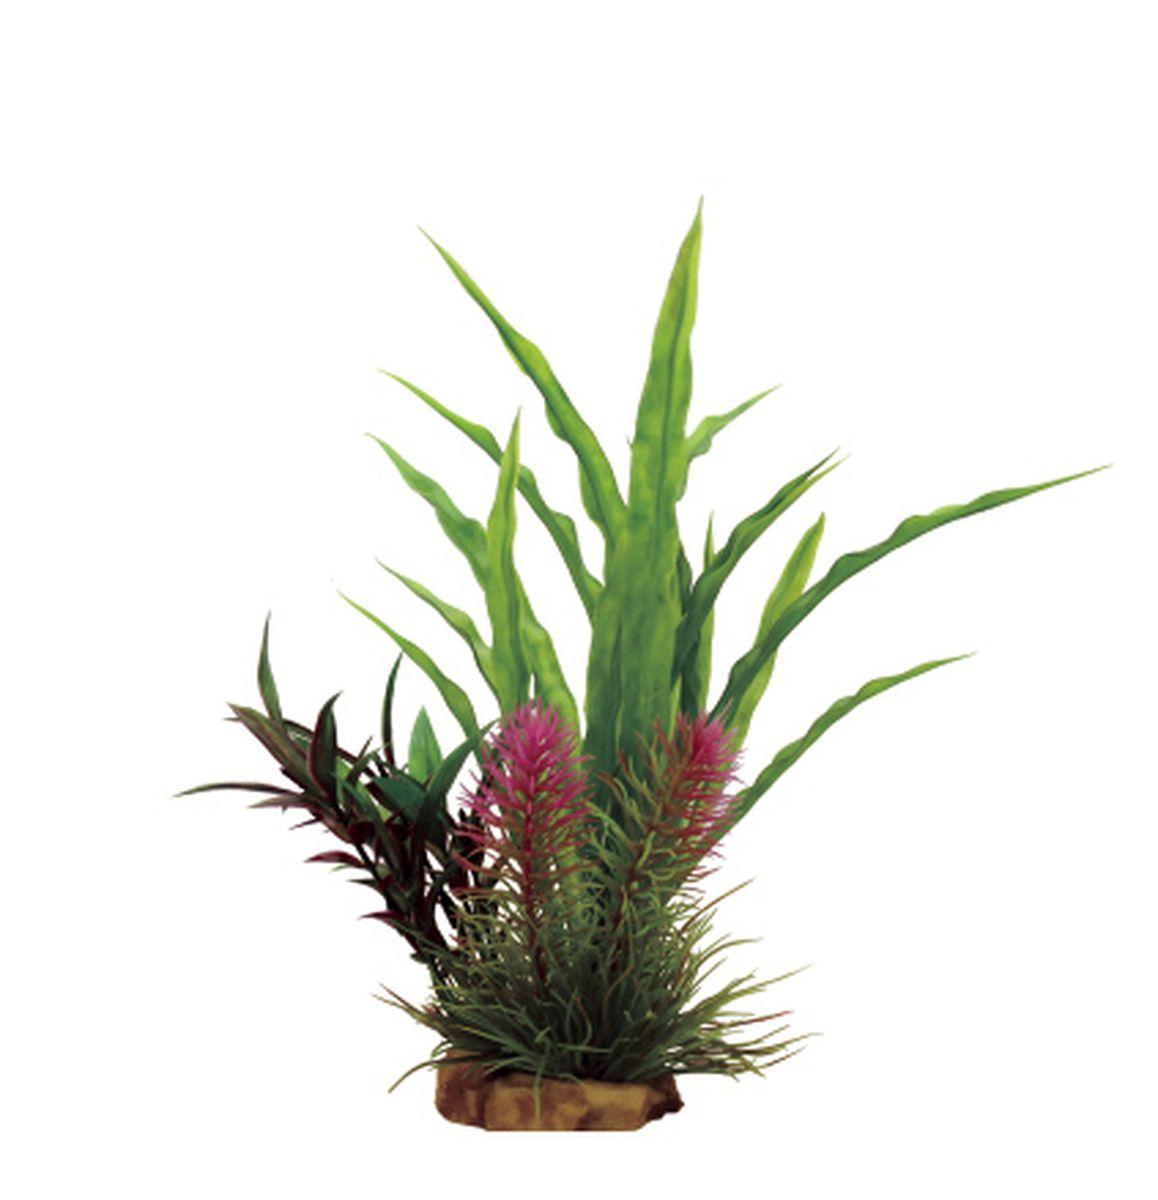 Композиция из растений для аквариума ArtUniq Криптокорина, 16 x 15 x 22 смART-1130811Композиция из растений для аквариума ArtUniq Криптокорина, 16 x 15 x 22 см